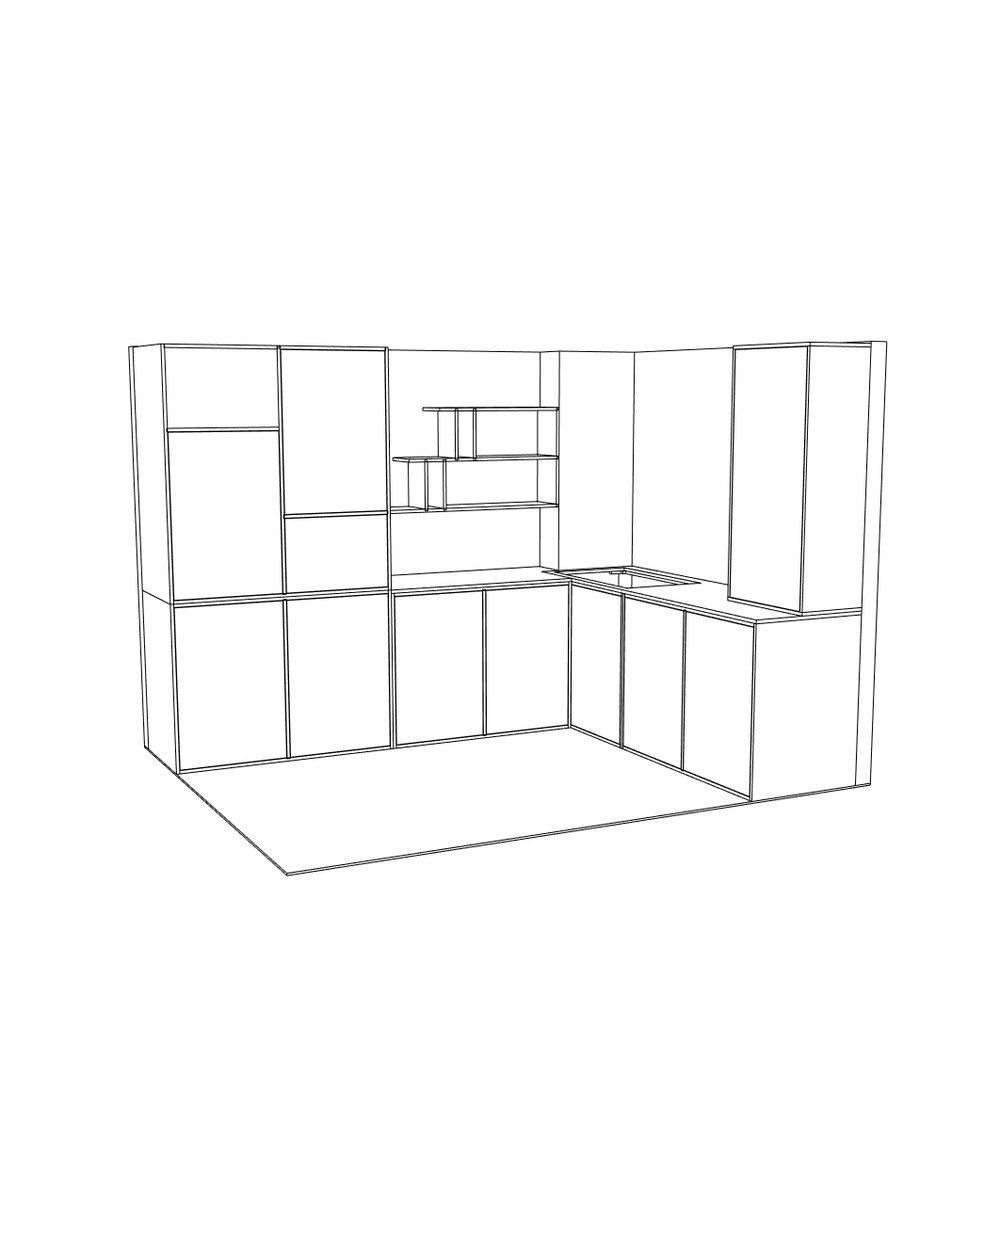 The 3D design file for Lozi's Birch kitchen